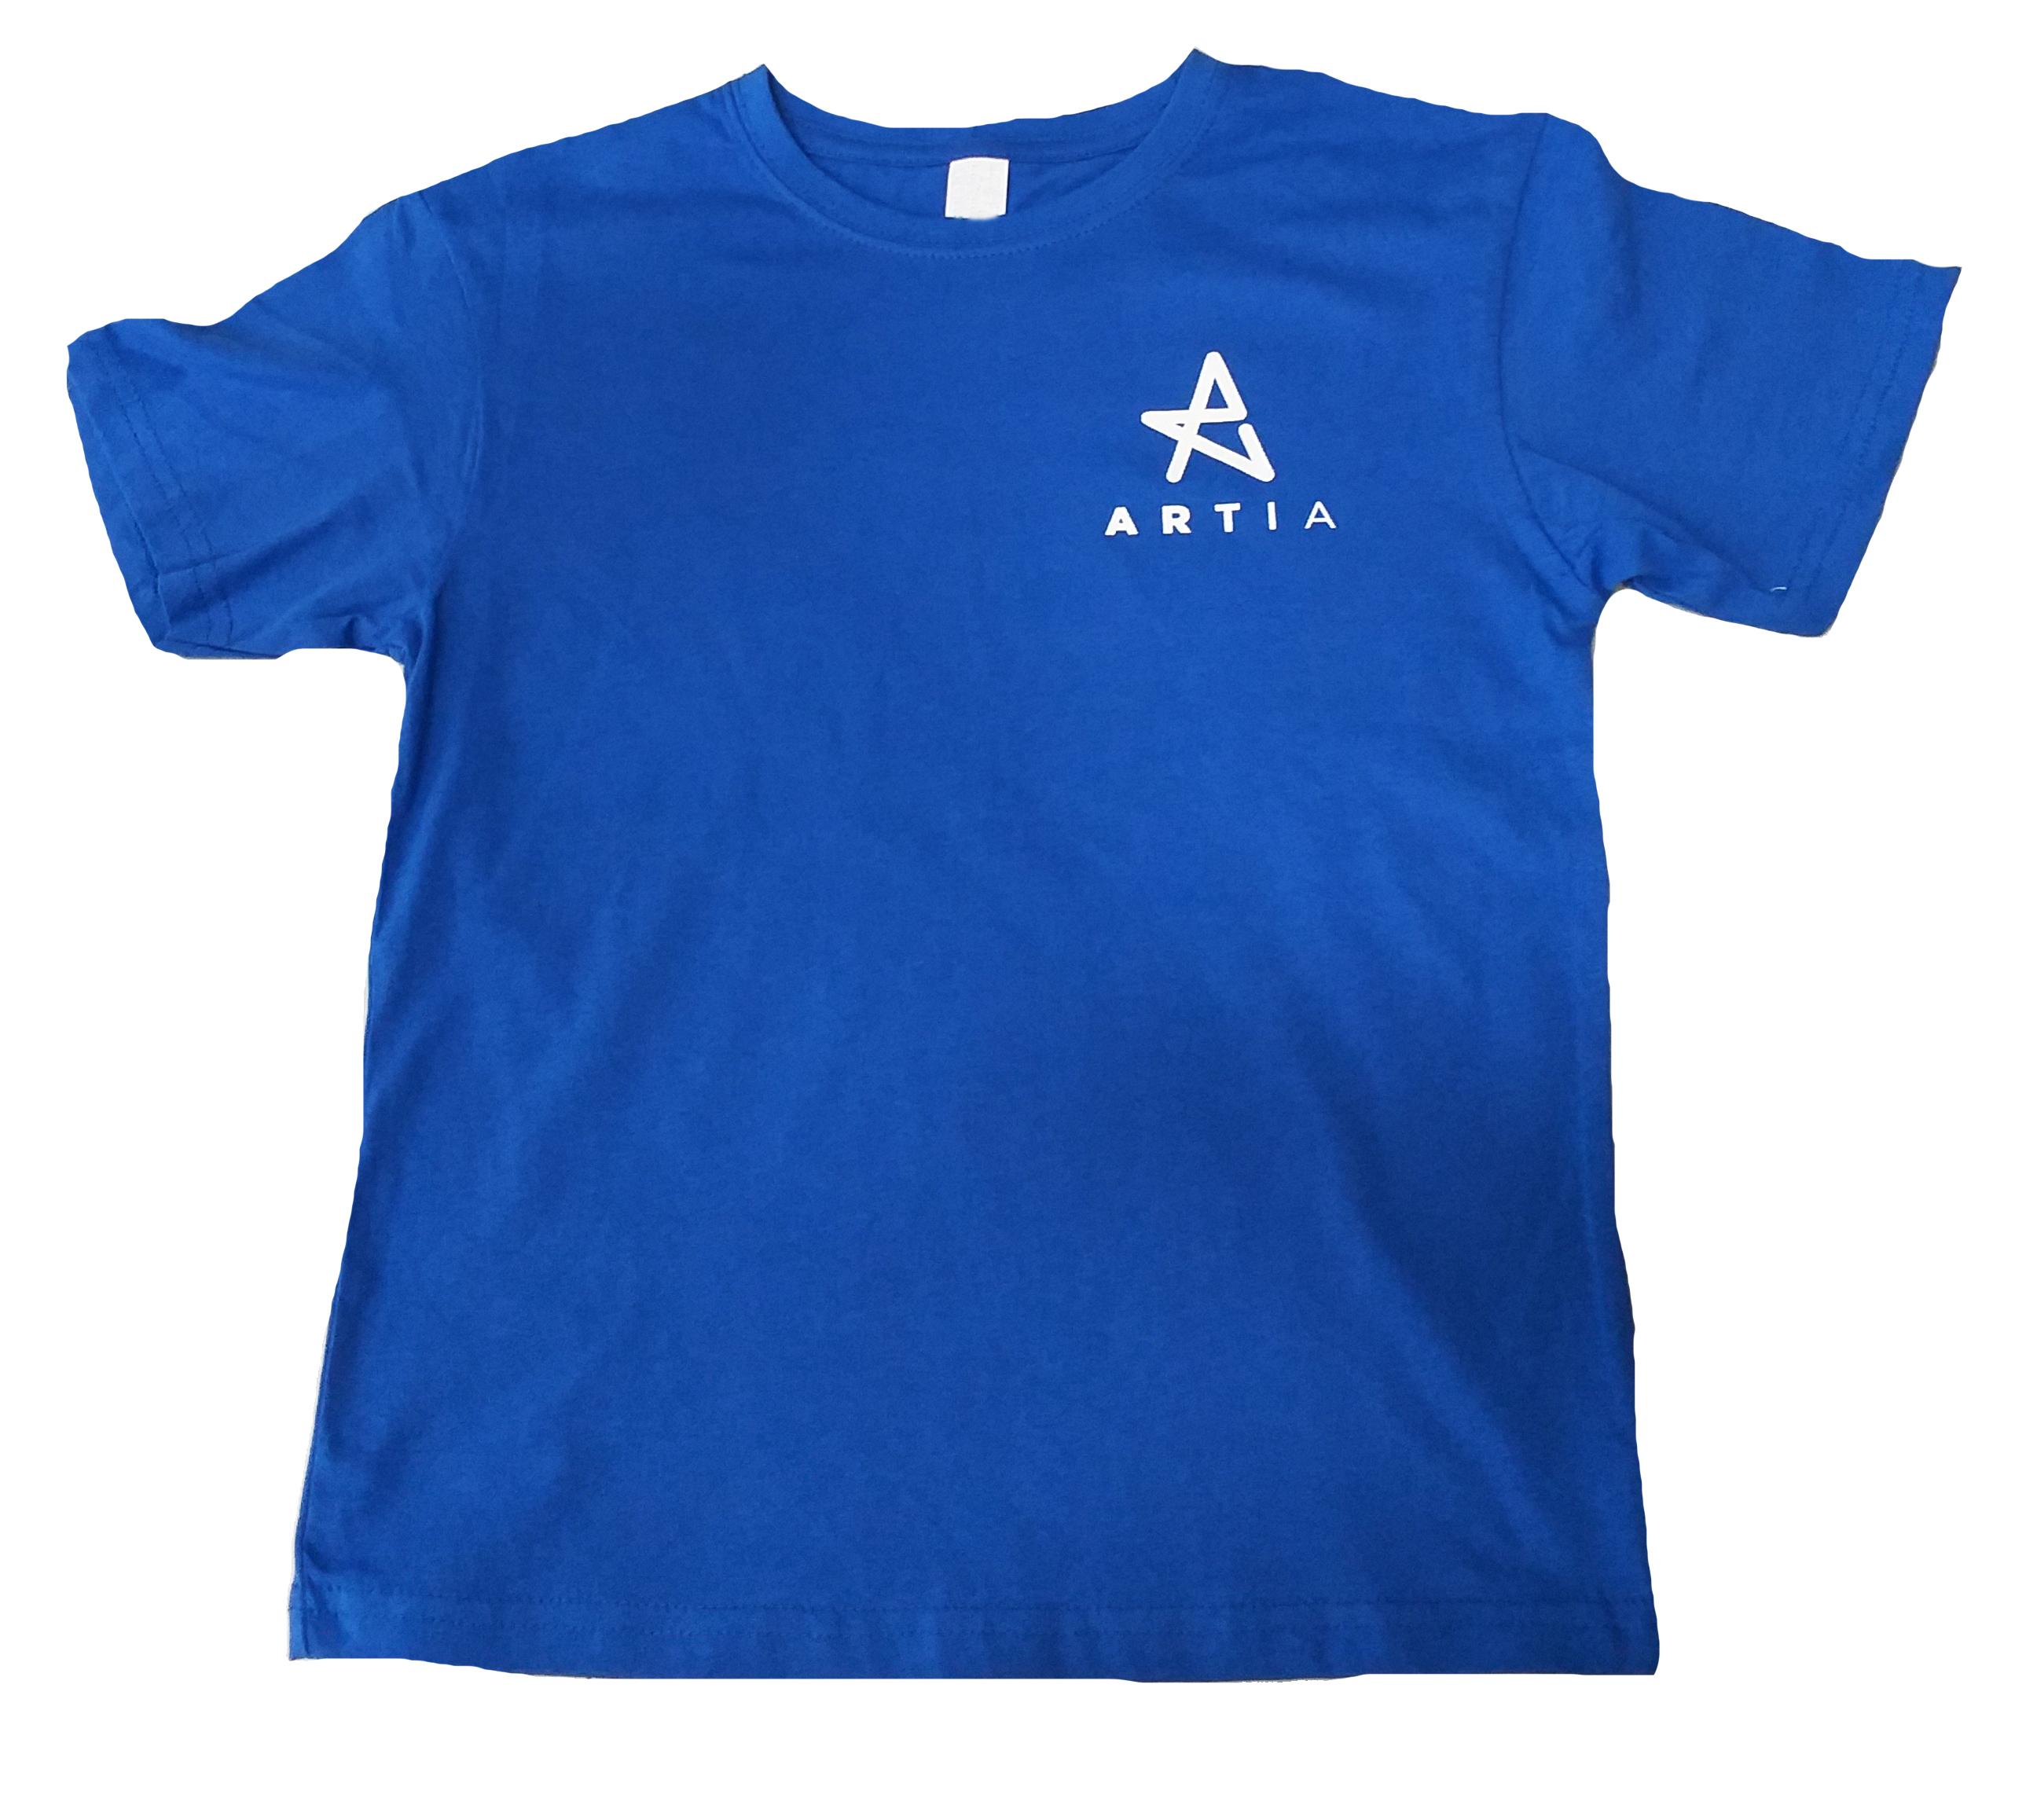 Camiseta_niño_Artia_azul